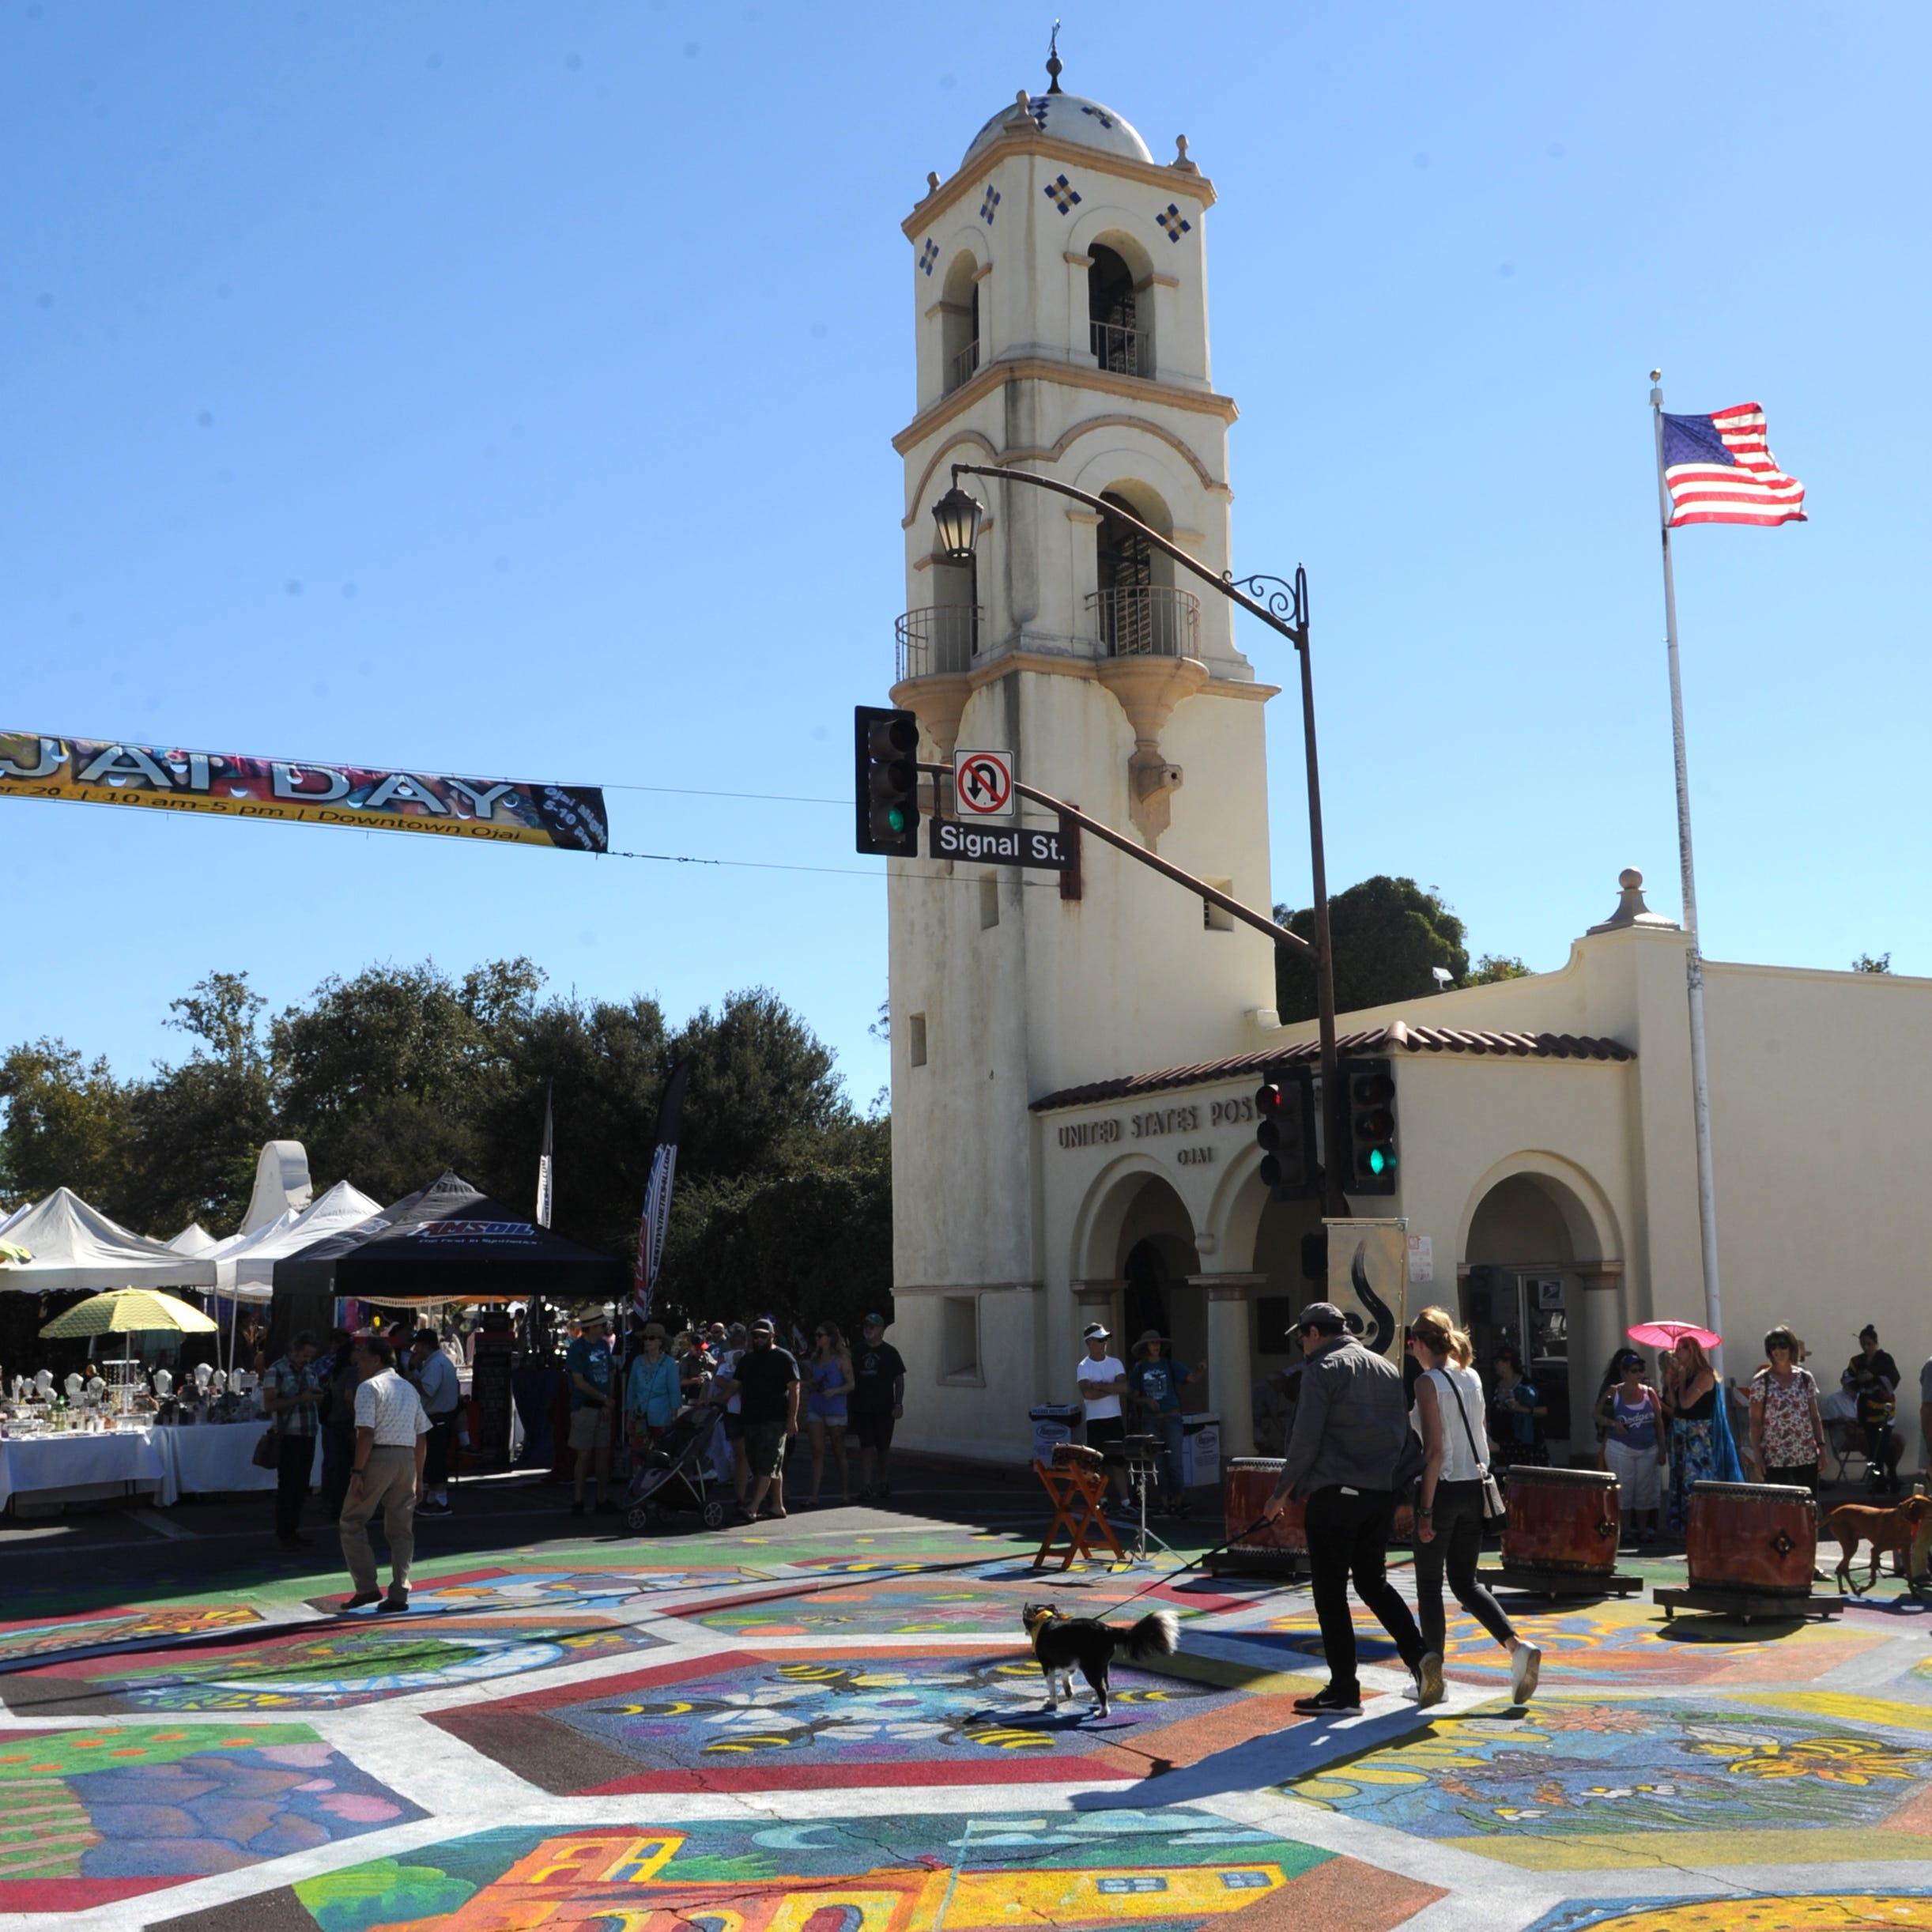 Ojai Day is an annual street fair in downtown Ojai that draws plenty of crowds.